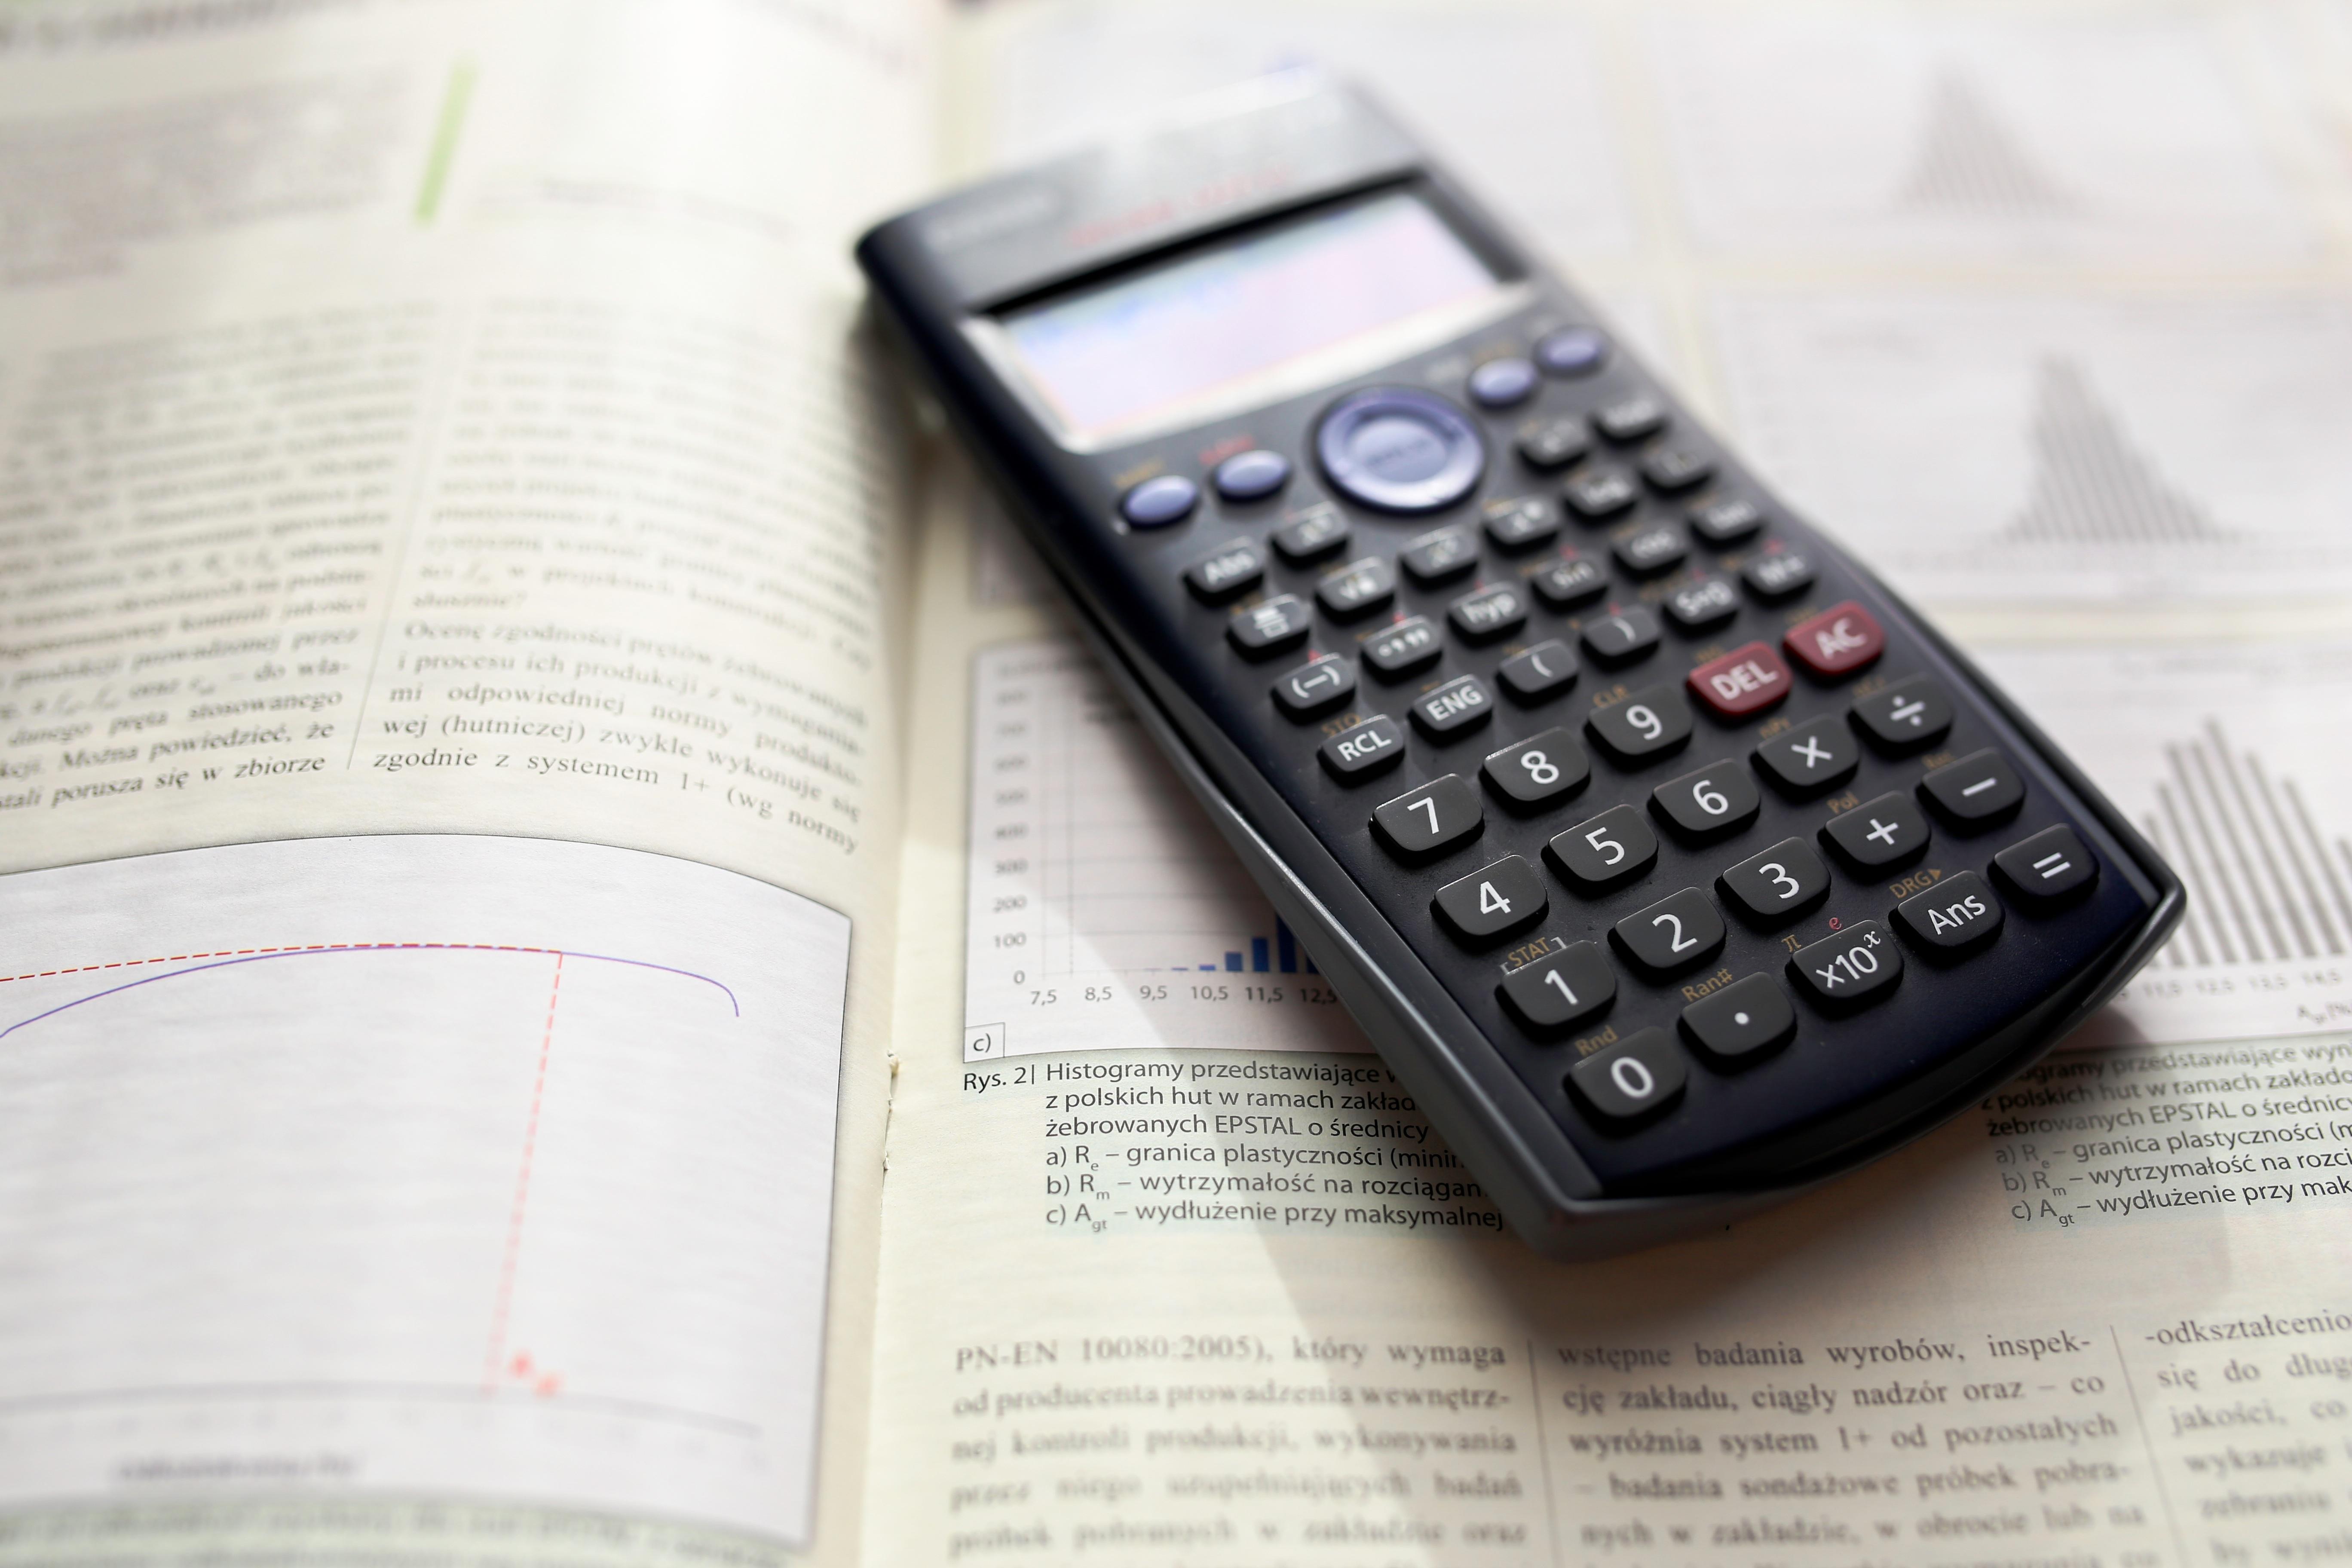 penulisan teknologi simbol peralatan kantor elektronik matematika pendidikan kas pameran digital matematika sekolah belajar pen ahuan dokumen